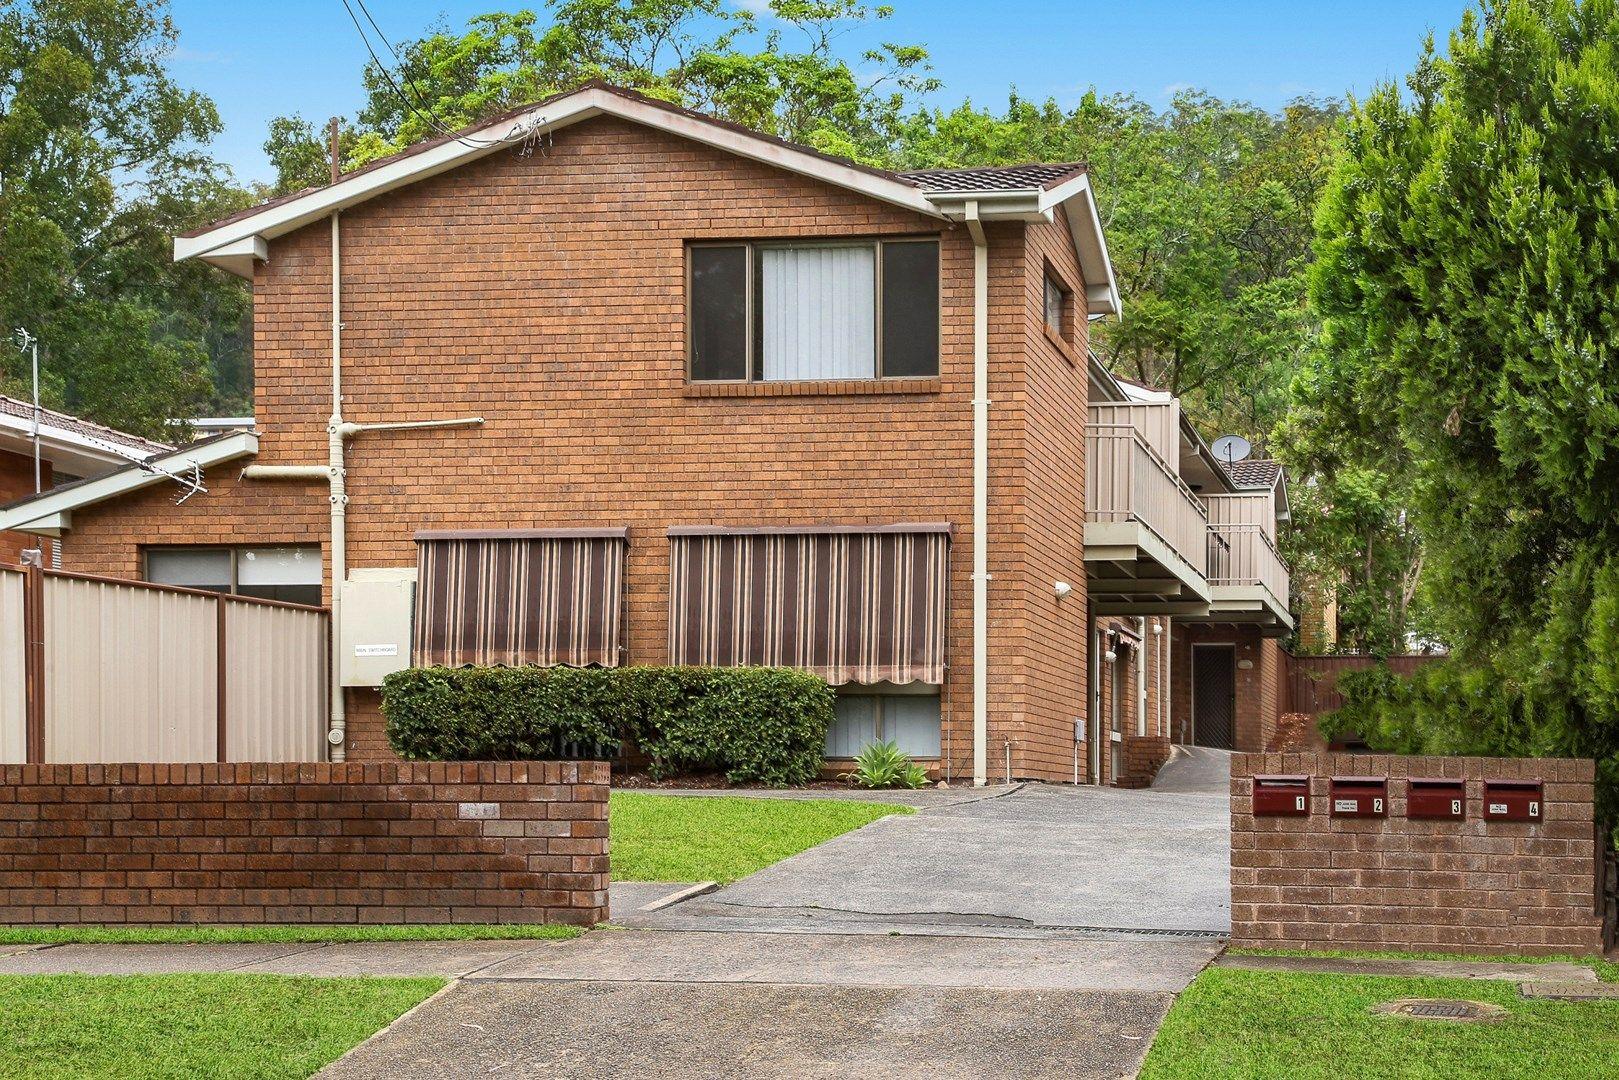 2/13 Beane Street West, Gosford NSW 2250, Image 0